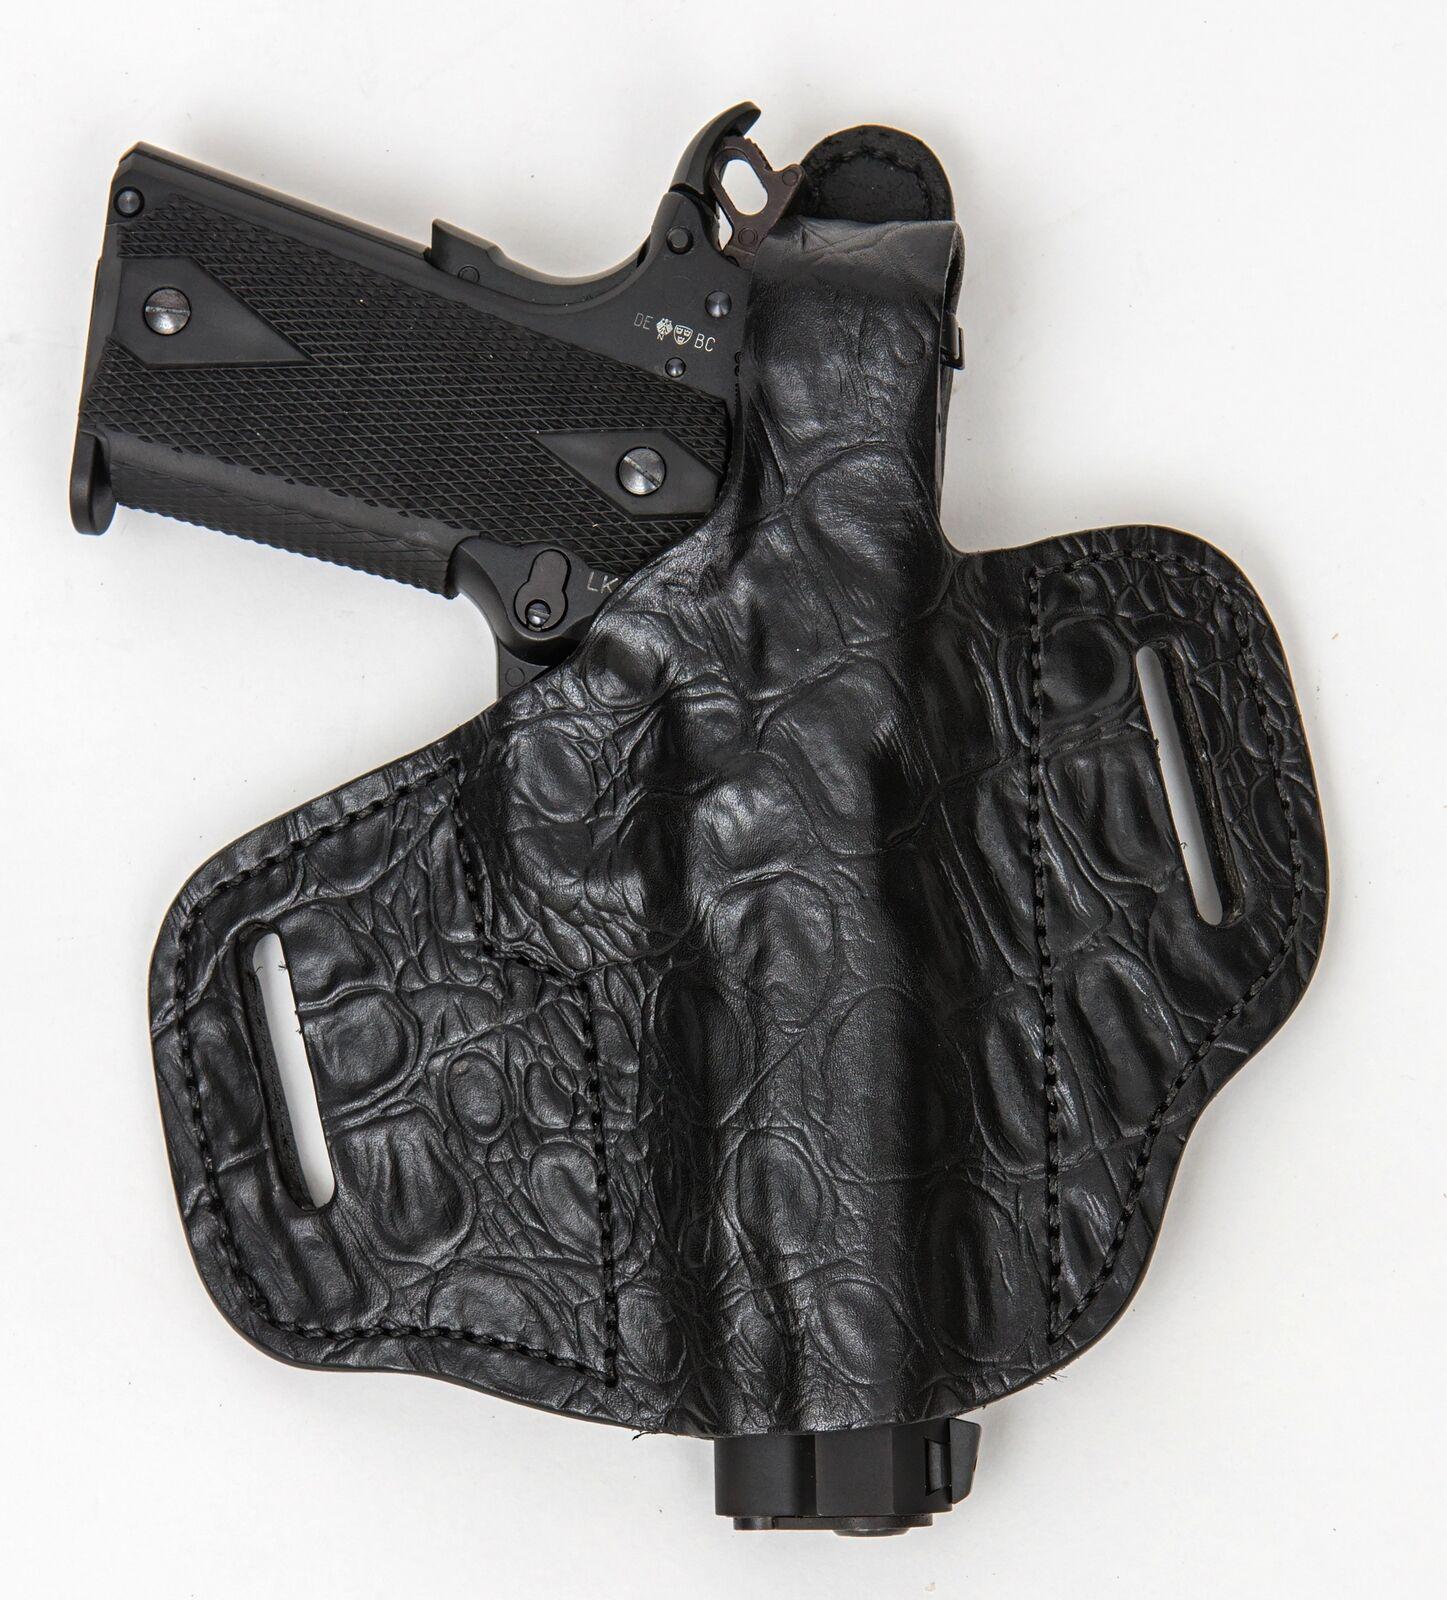 On Duty Conceal RH LH OWB Leather Gun Holster For Colt Officer